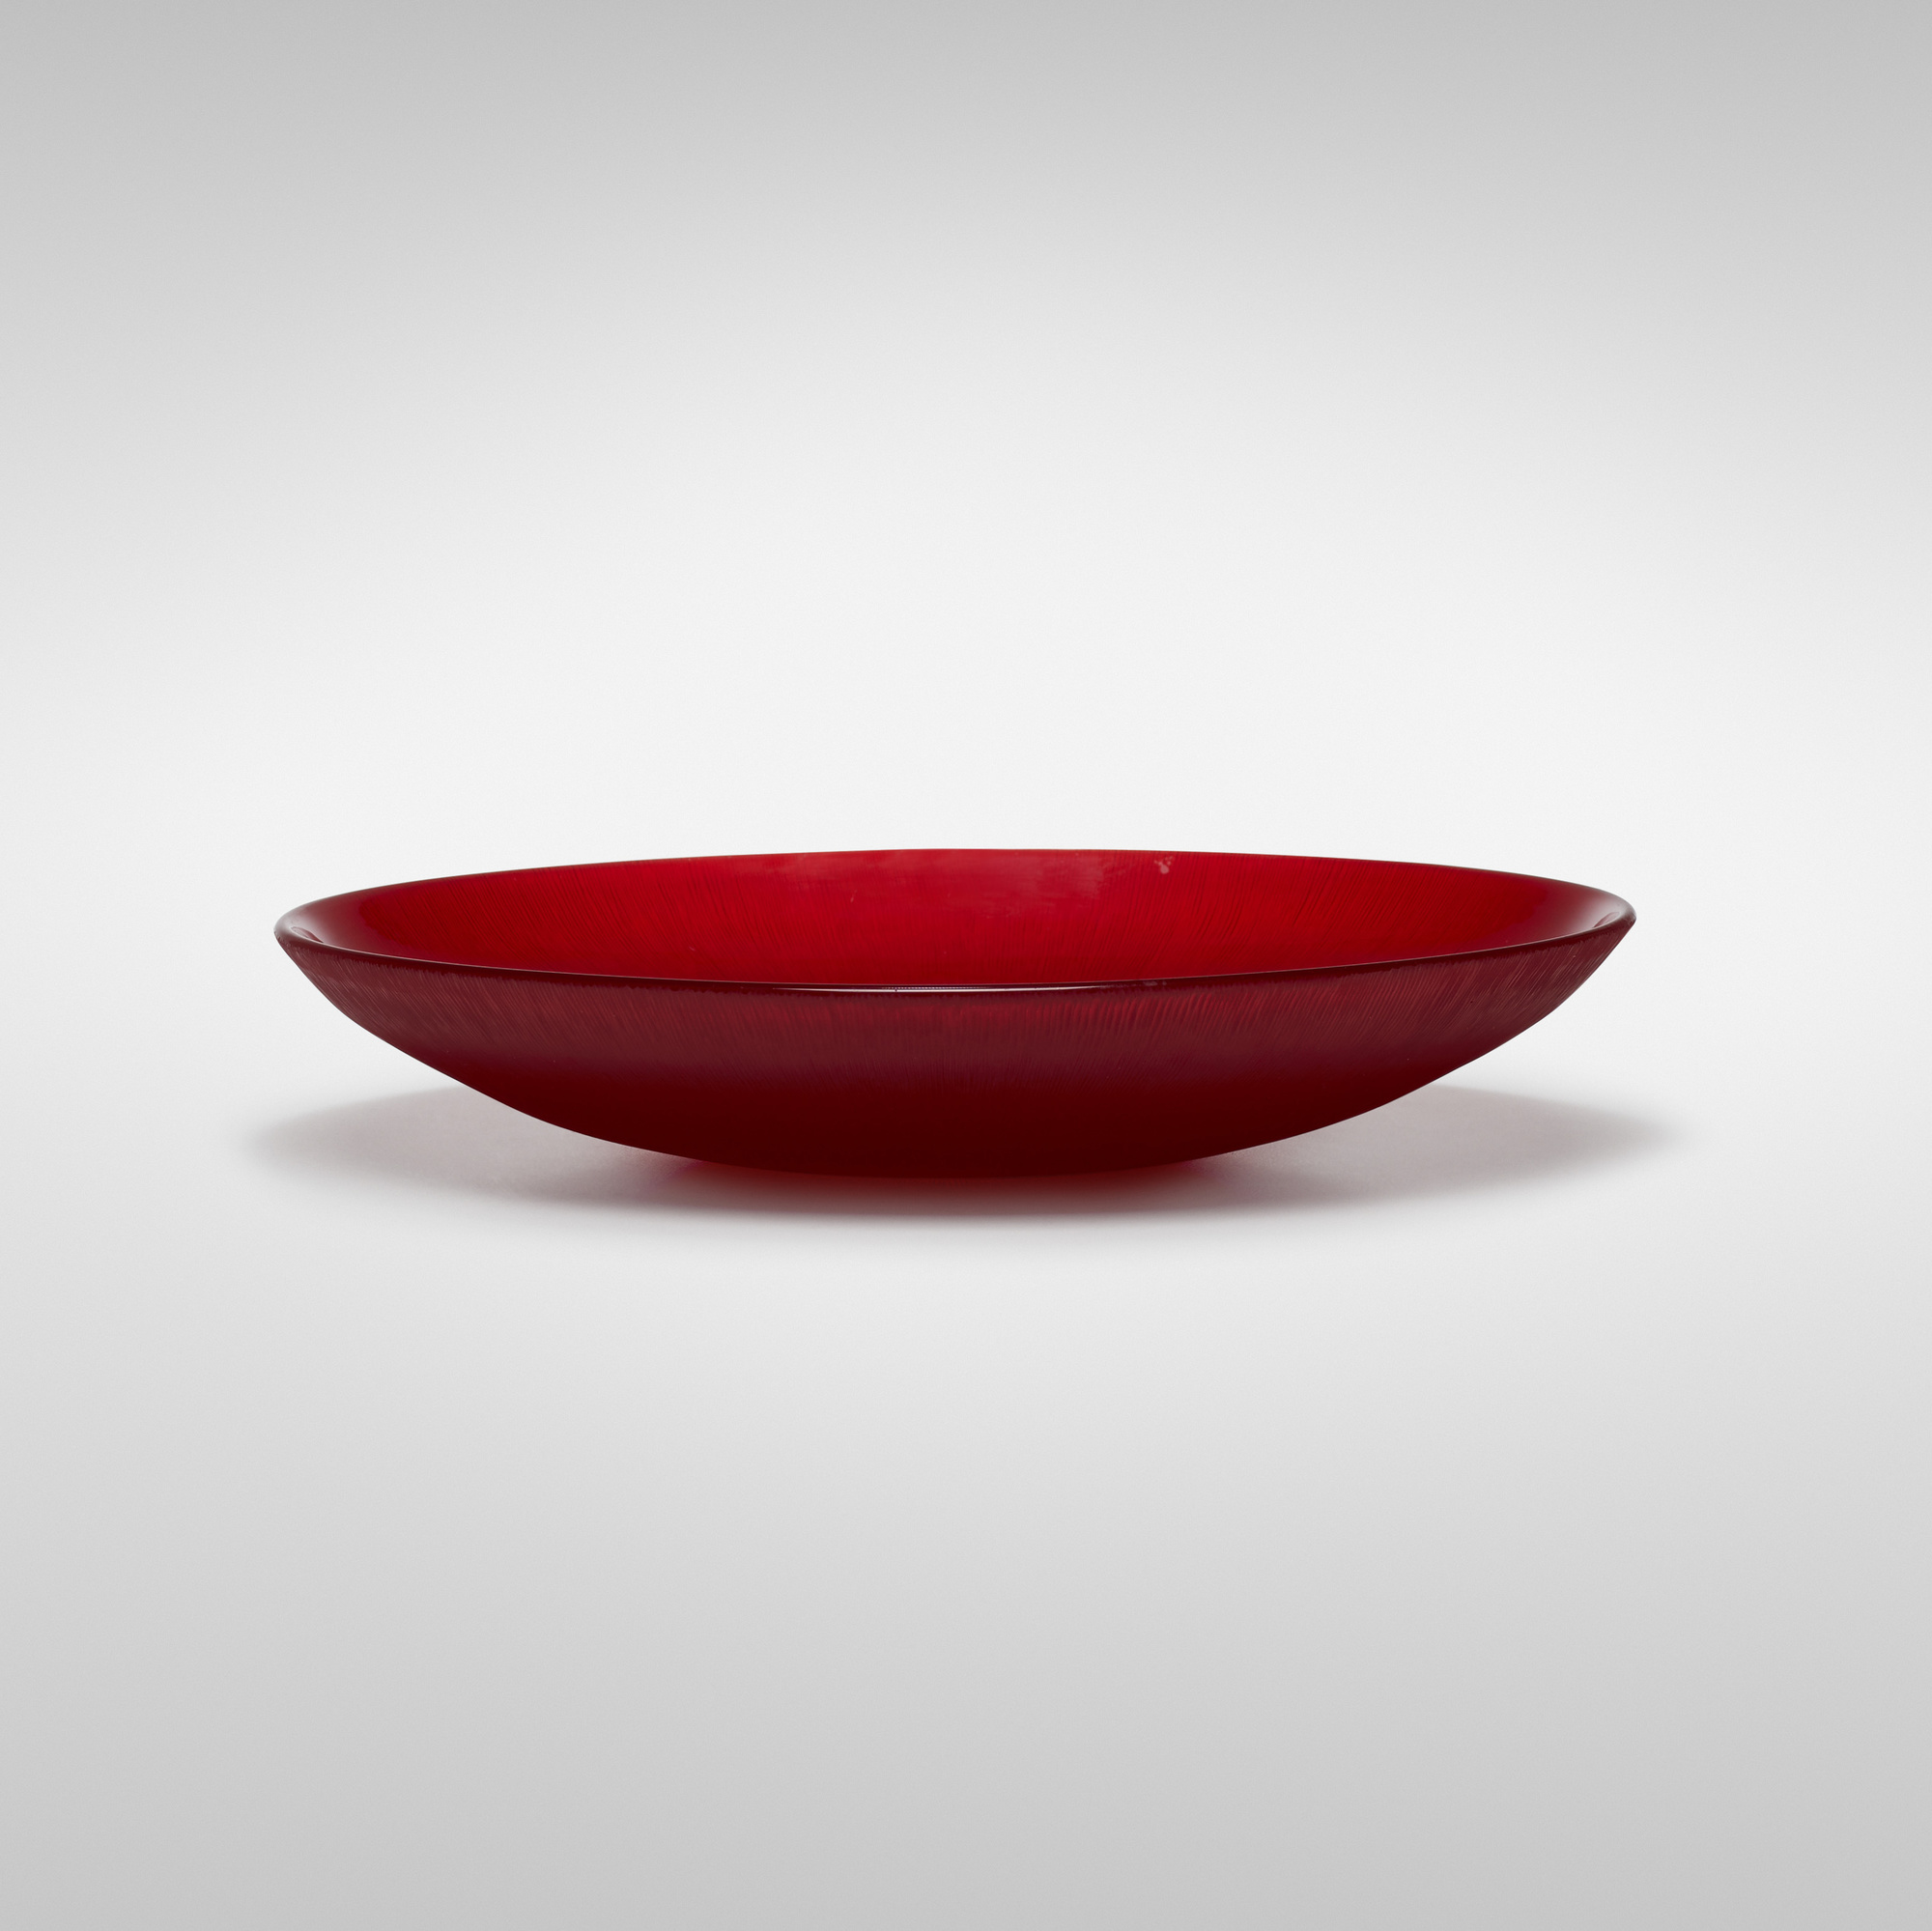 128: Carlo Scarpa / Battuto bowl, model 3760 (1 of 2)